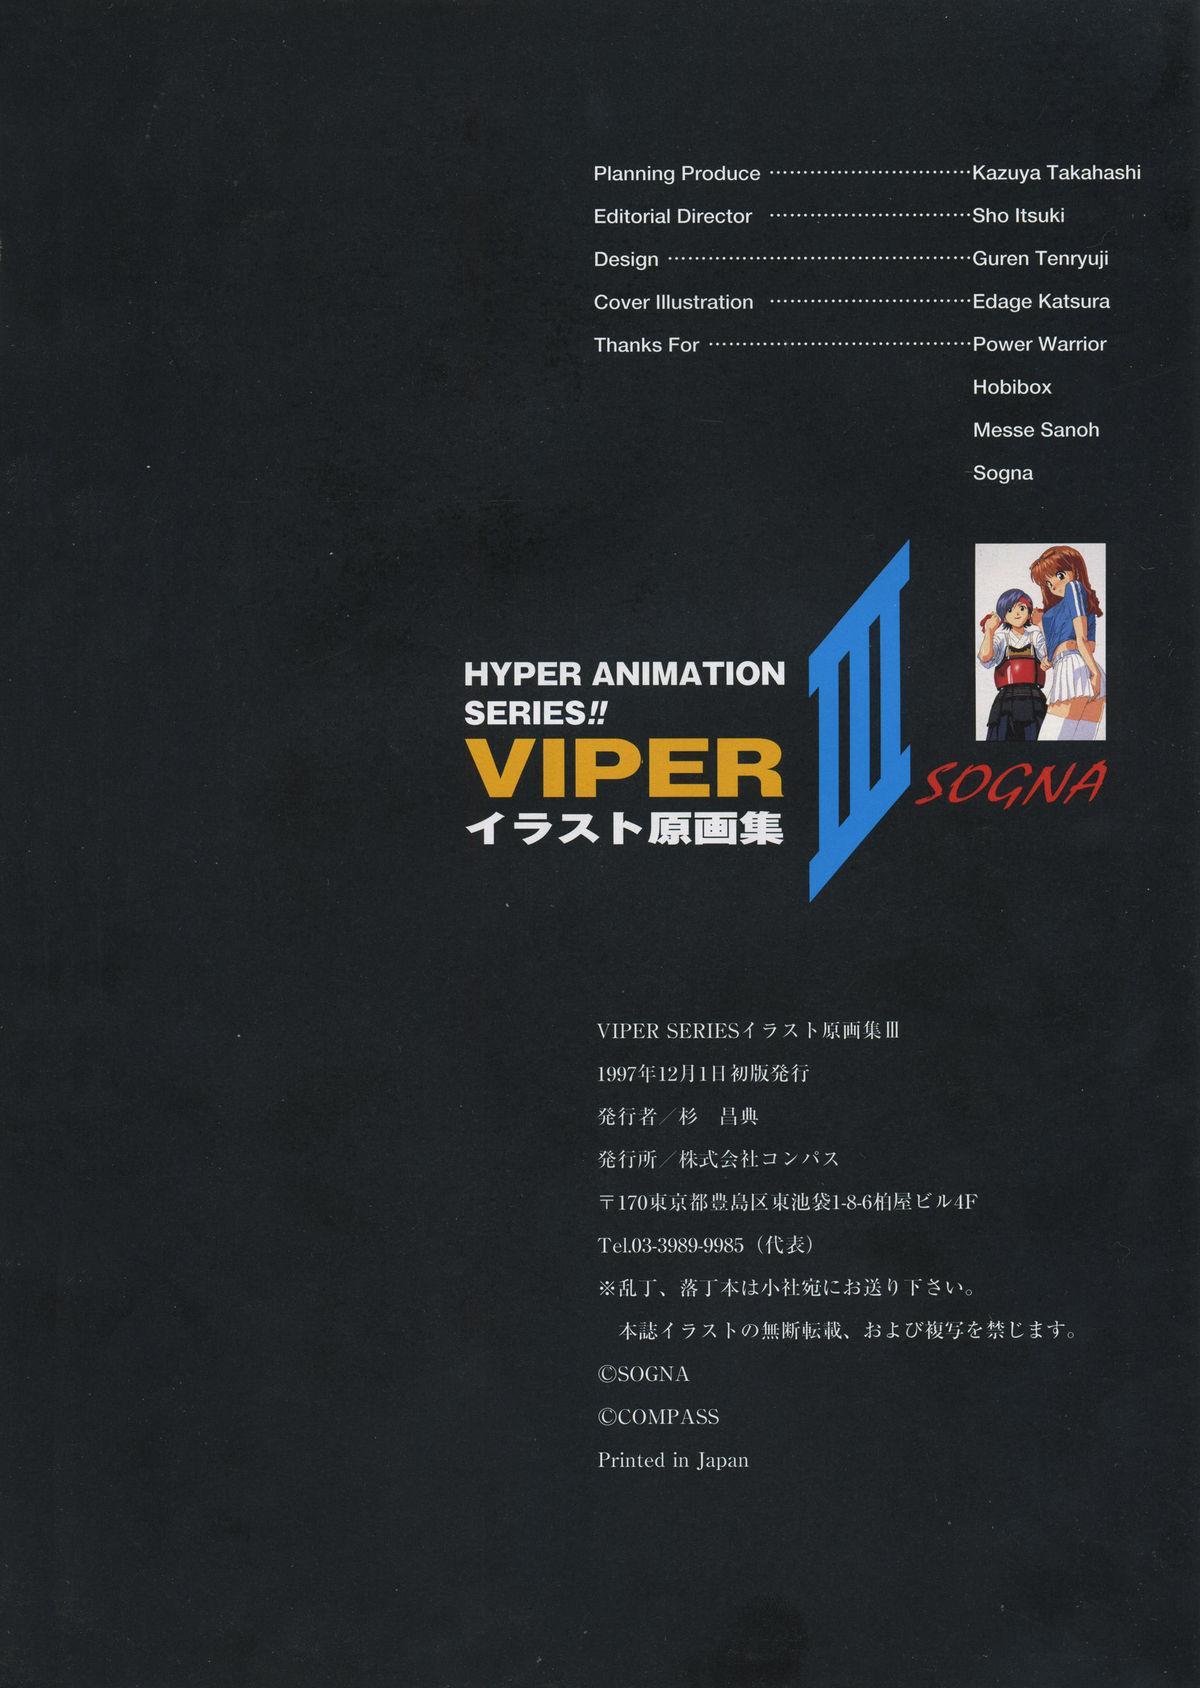 VIPER Series Official Artbook III 110